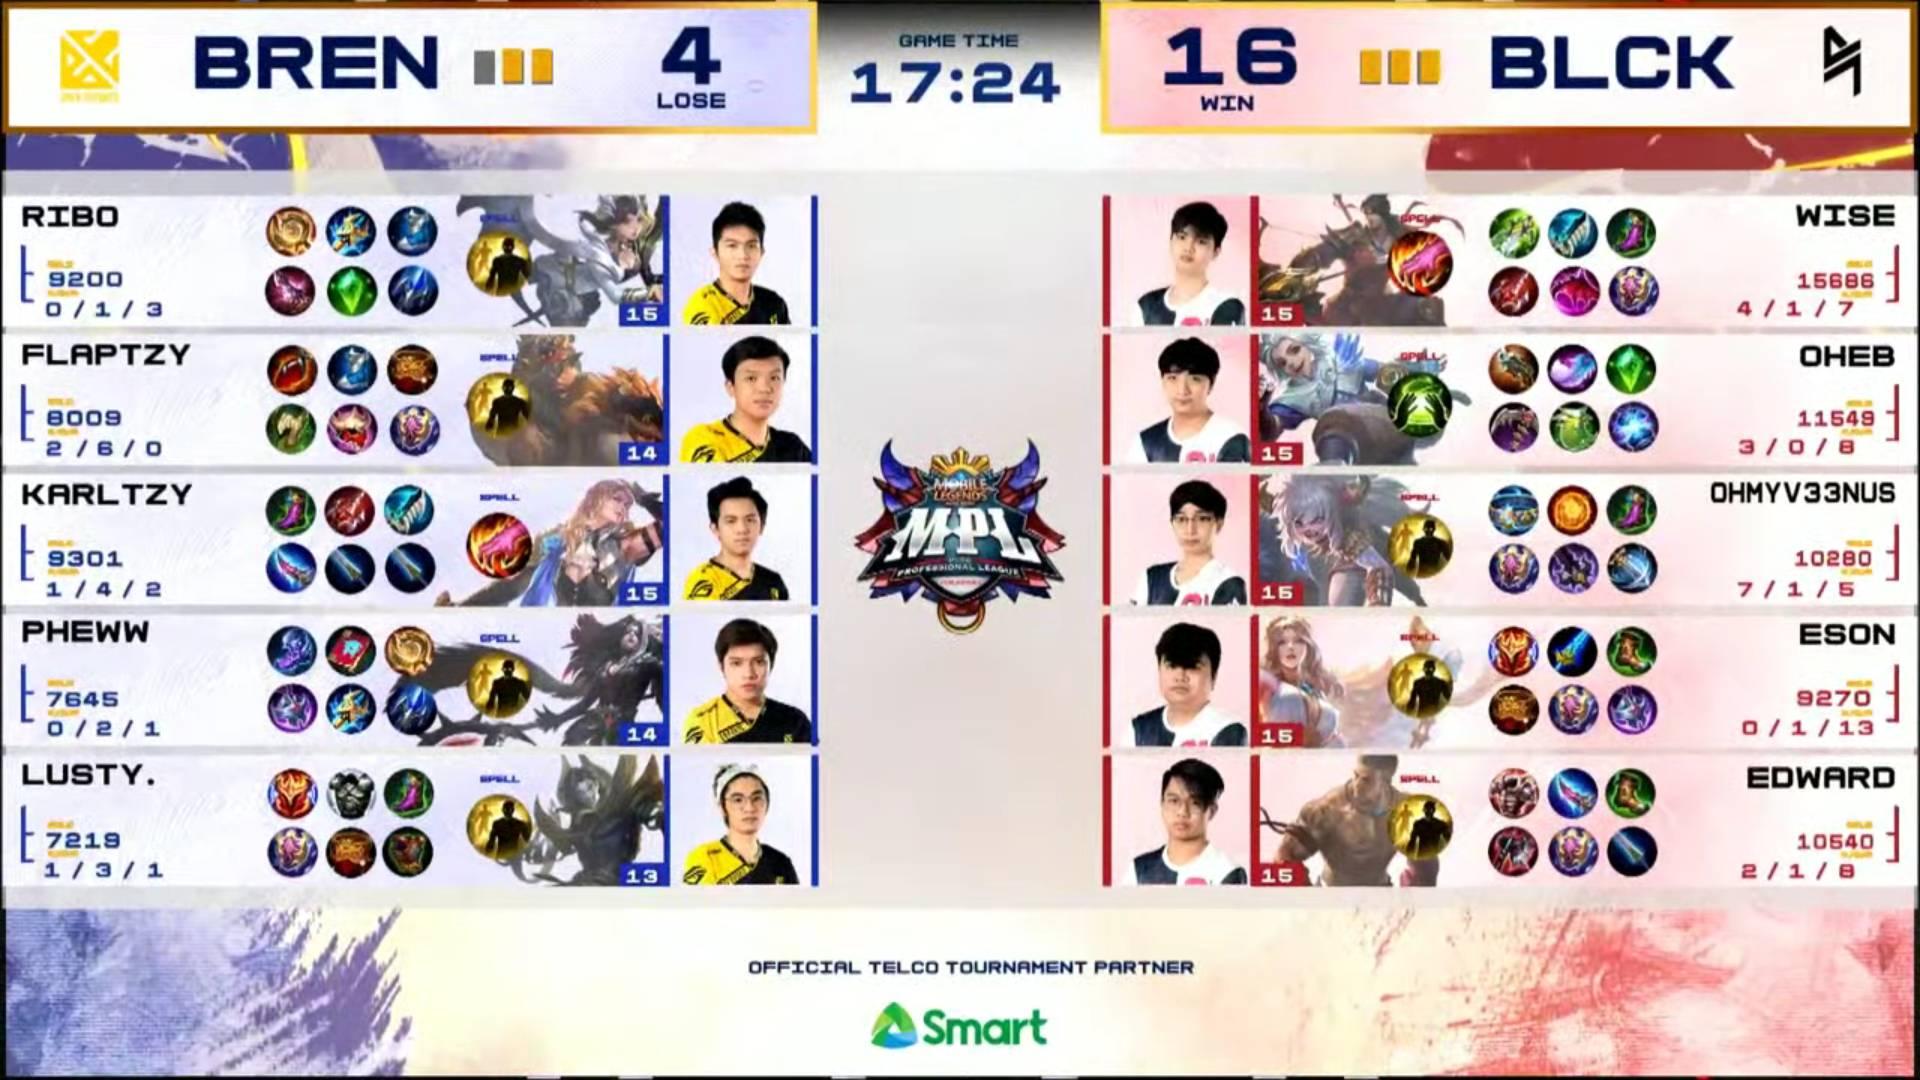 MPL-PH-Season-7-upper-bracket-Blacklist-def-Bren-Game-5 Edward, Blacklist survive KarlTzy's storm, sends Bren to MPL lower bracket ESports Mobile Legends MPL-PH News  - philippine sports news